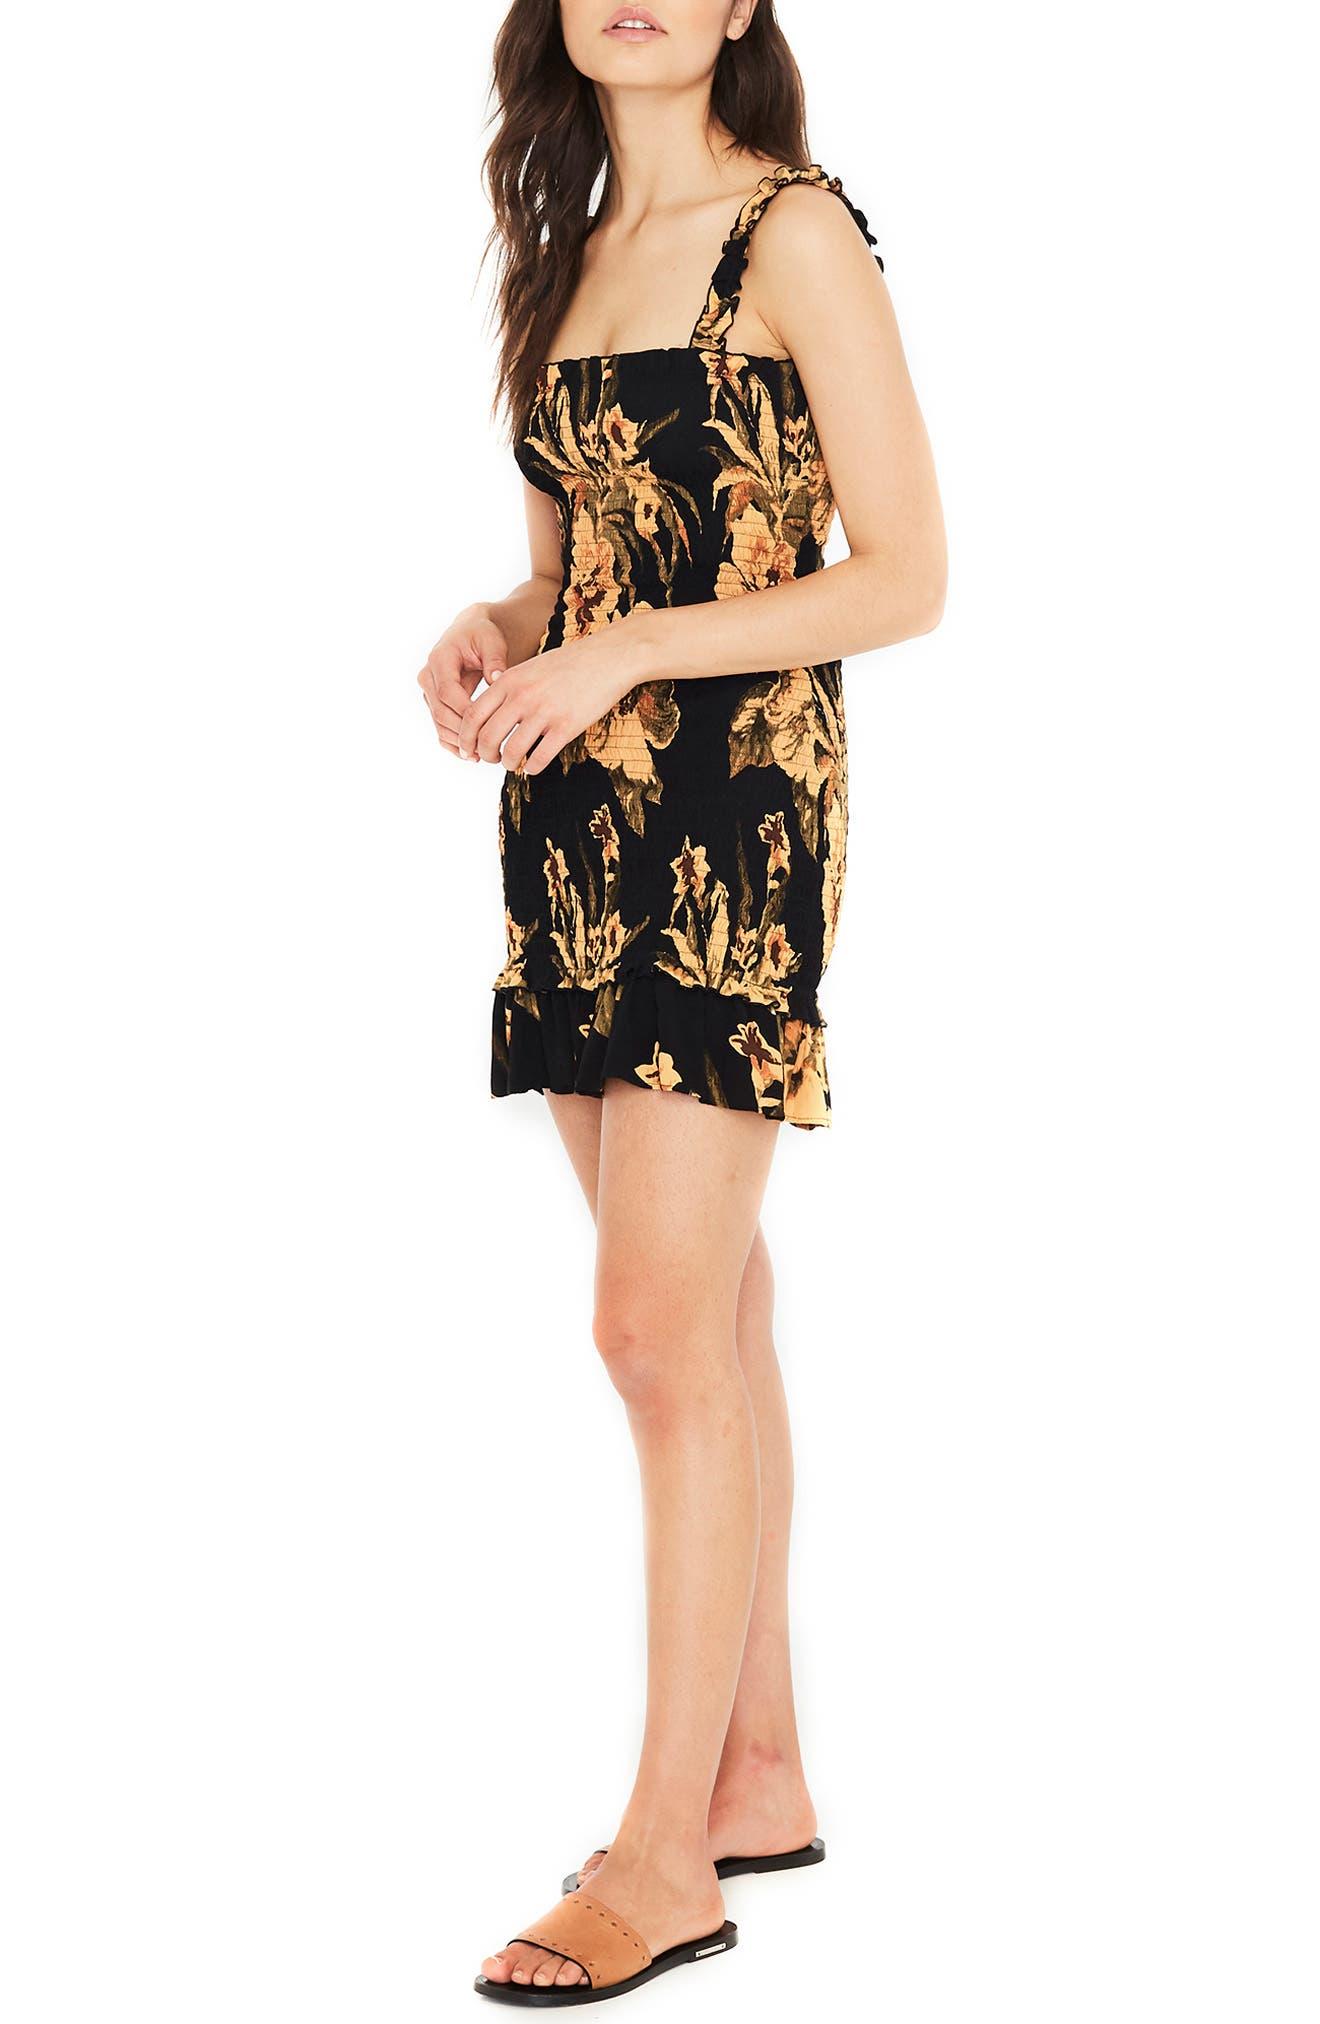 Del Mar Smocked Dress,                             Alternate thumbnail 3, color,                             CARIBBEAN PRINT